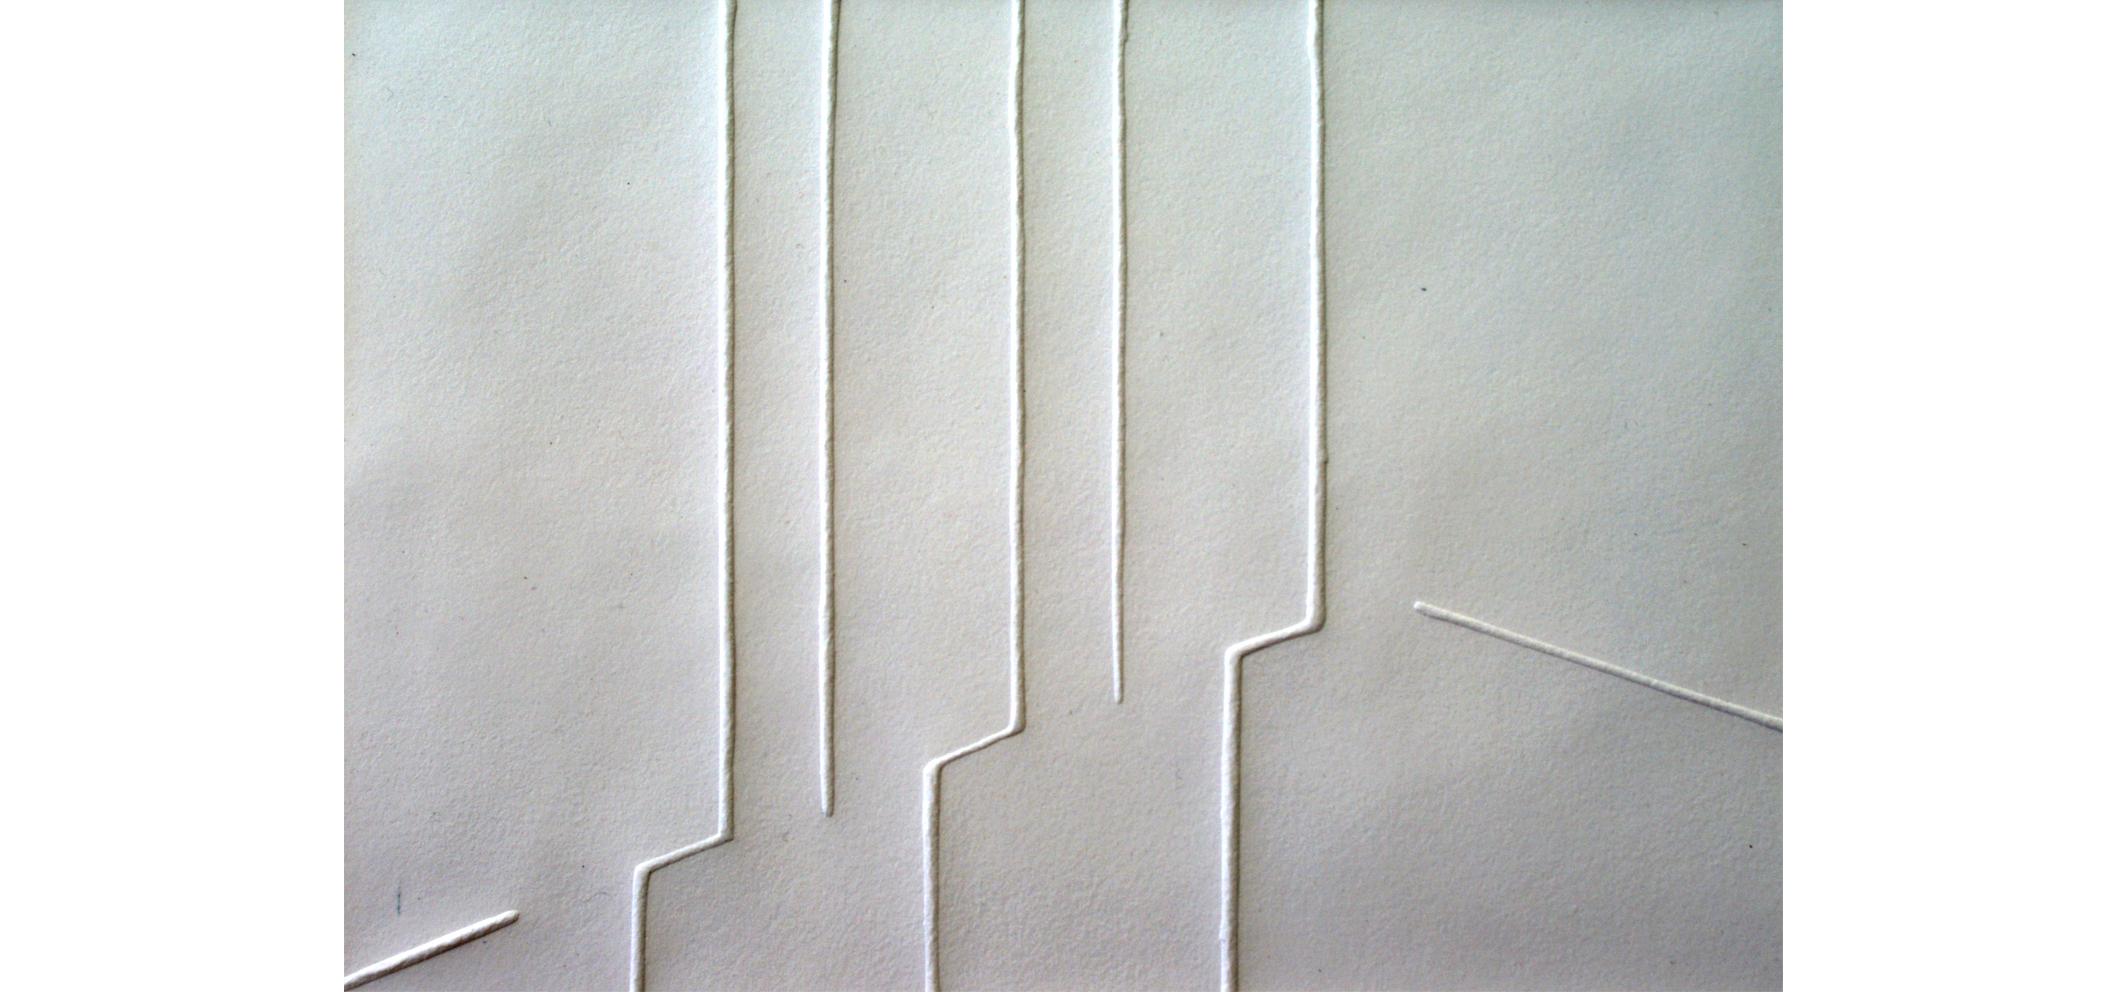 Ostia III, 2012 (blinddruk) 17cm x 24,5cm